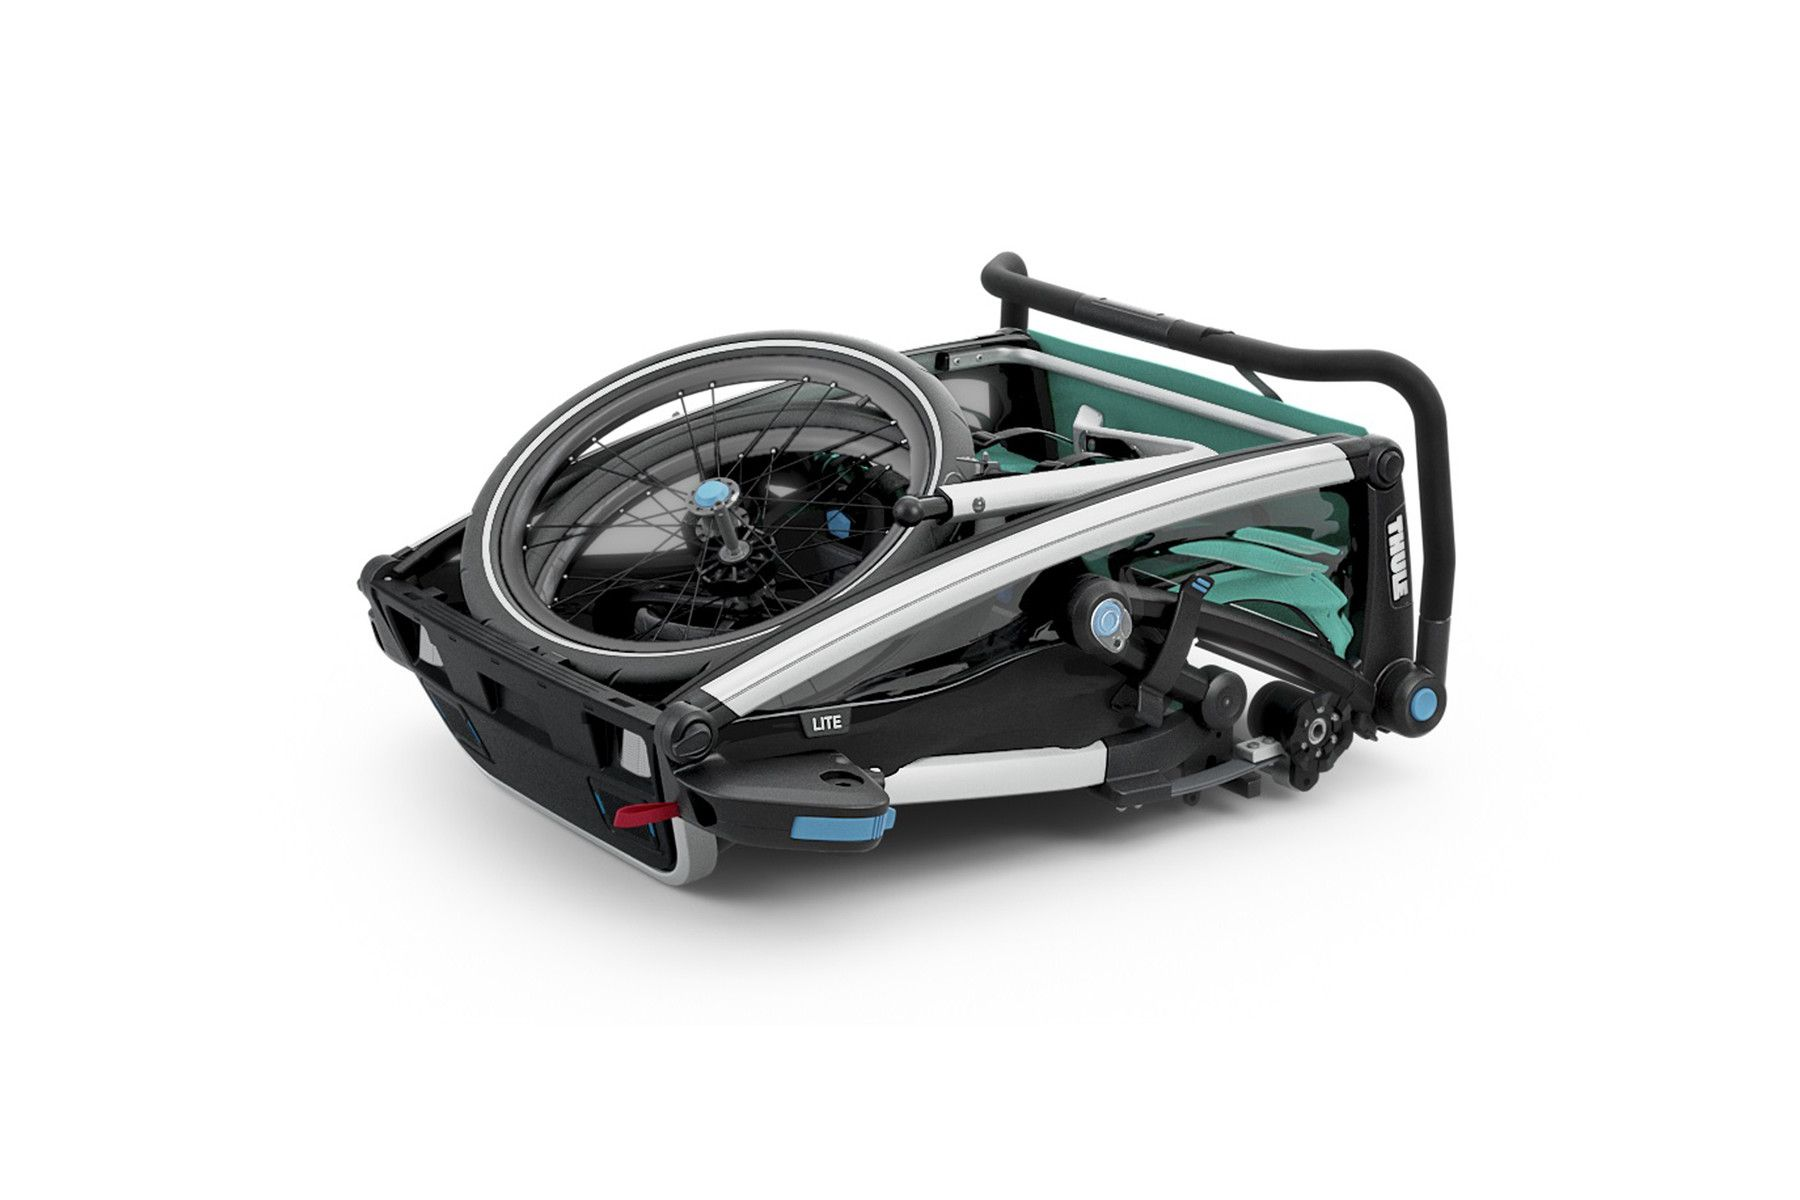 Thule Chariot Lite In 2020 Thule Chariot Child Bike Seat Thule Bike